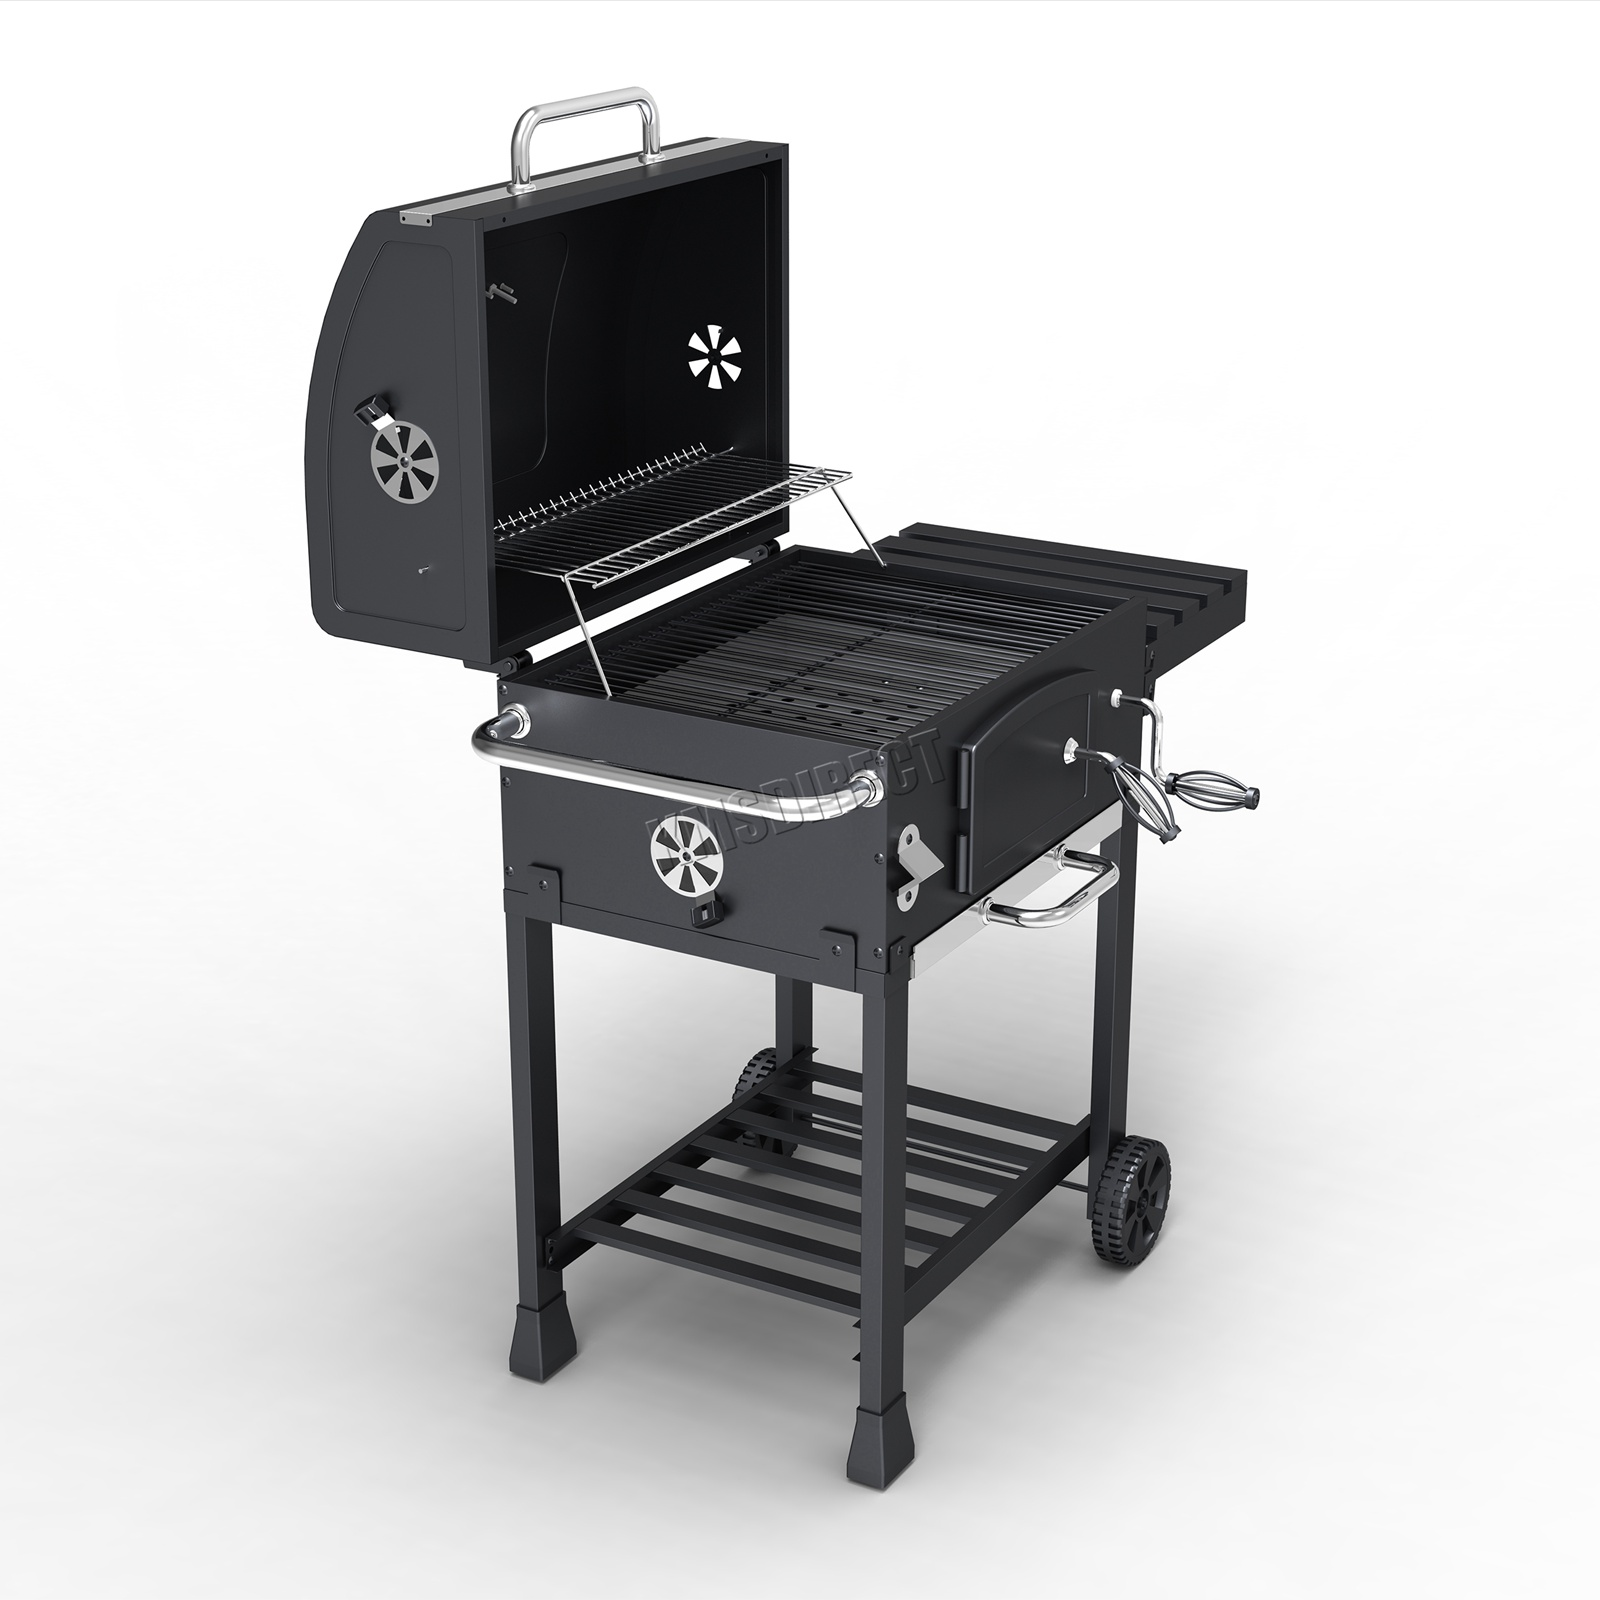 Foxhunter antracite grigliata grill barbecue affumicatore for Affumicatore portatile